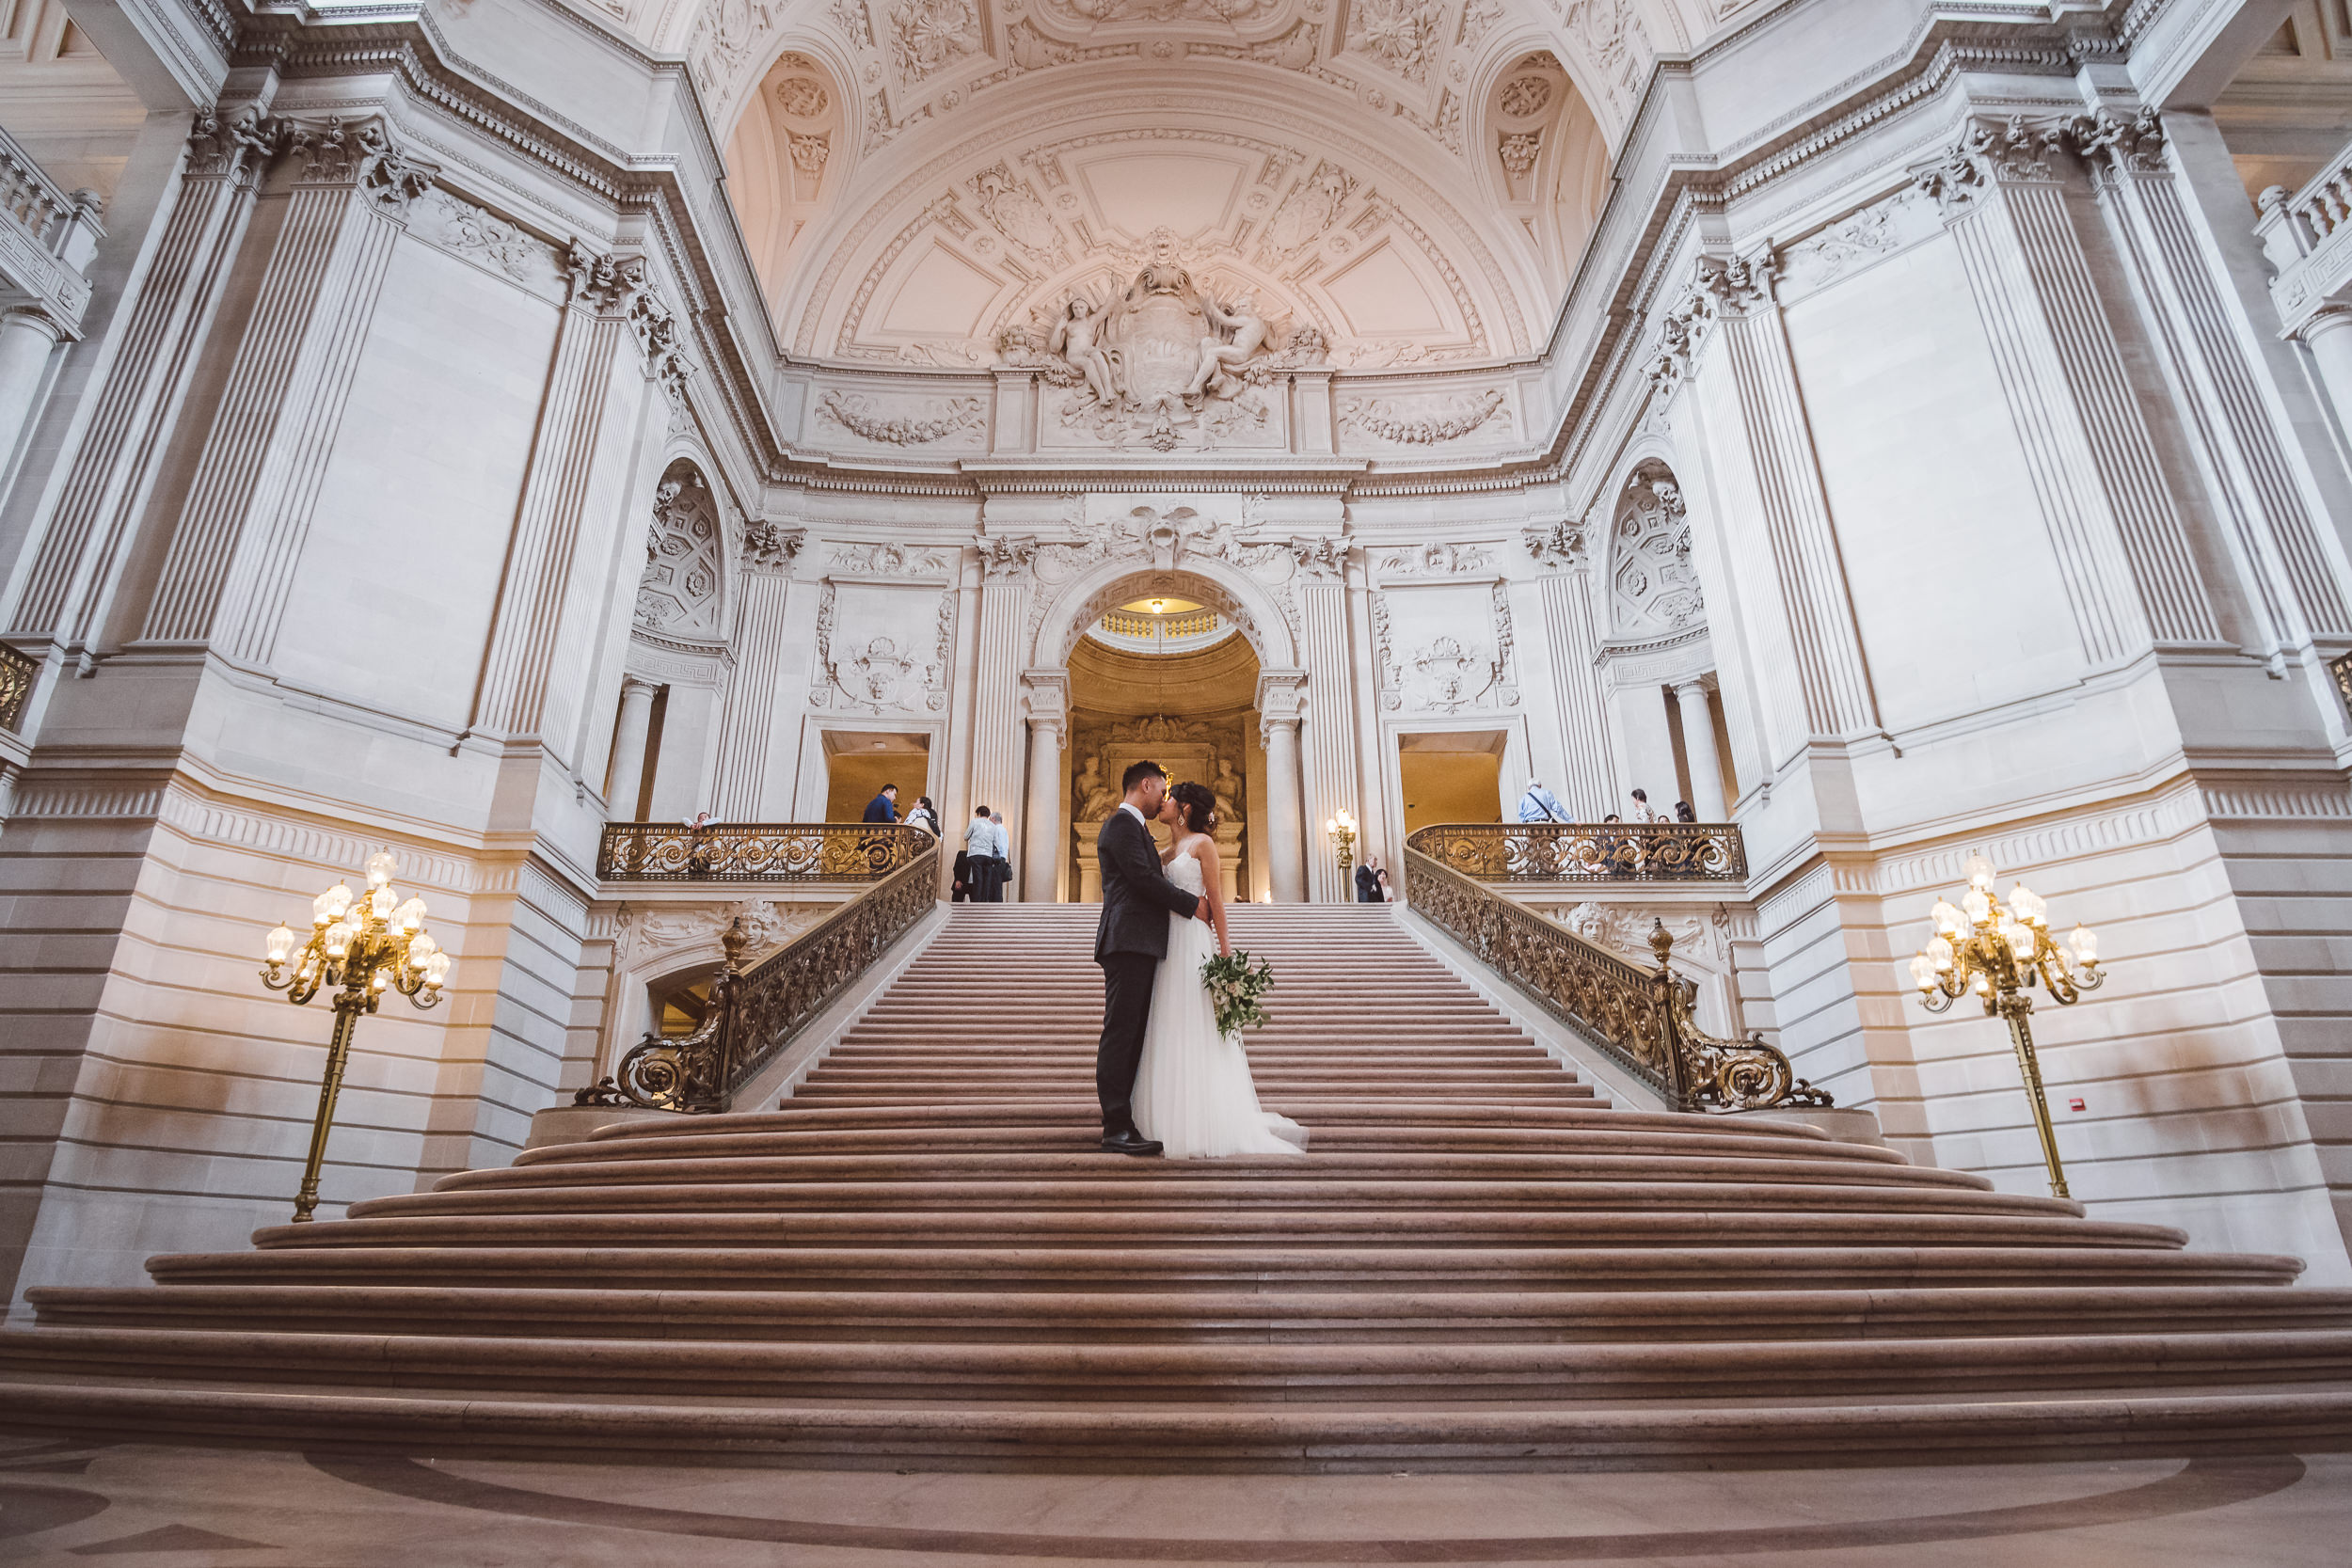 San-Francisco-City-Hall-Wedding-Photography-068.jpg